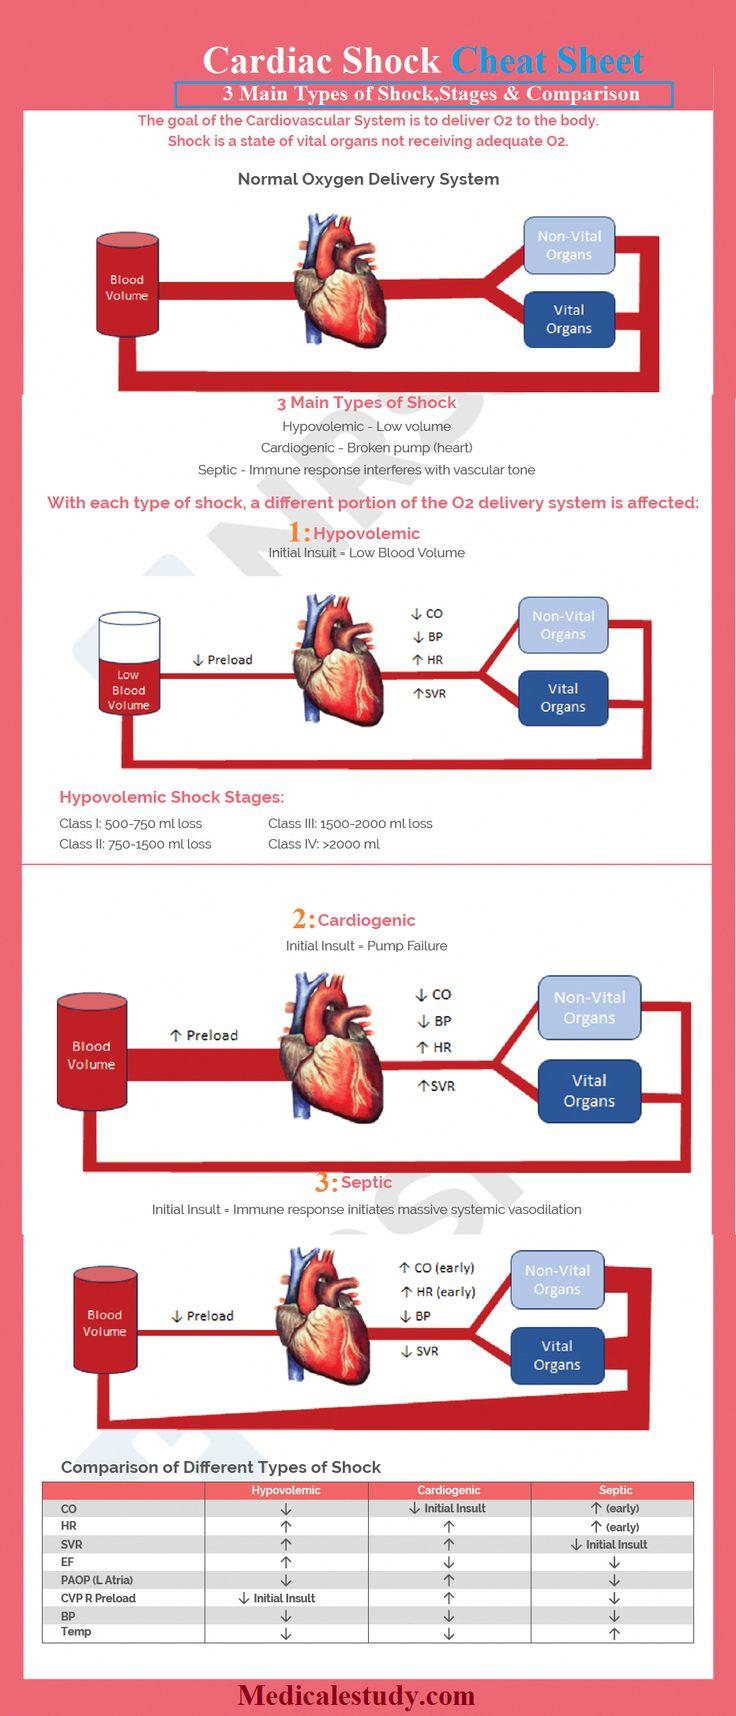 shock types stages comparison cheat sheet nursing medical cardiac certification nurse medicalestudy heart care program mitral four mnemonics programs lpnnurse